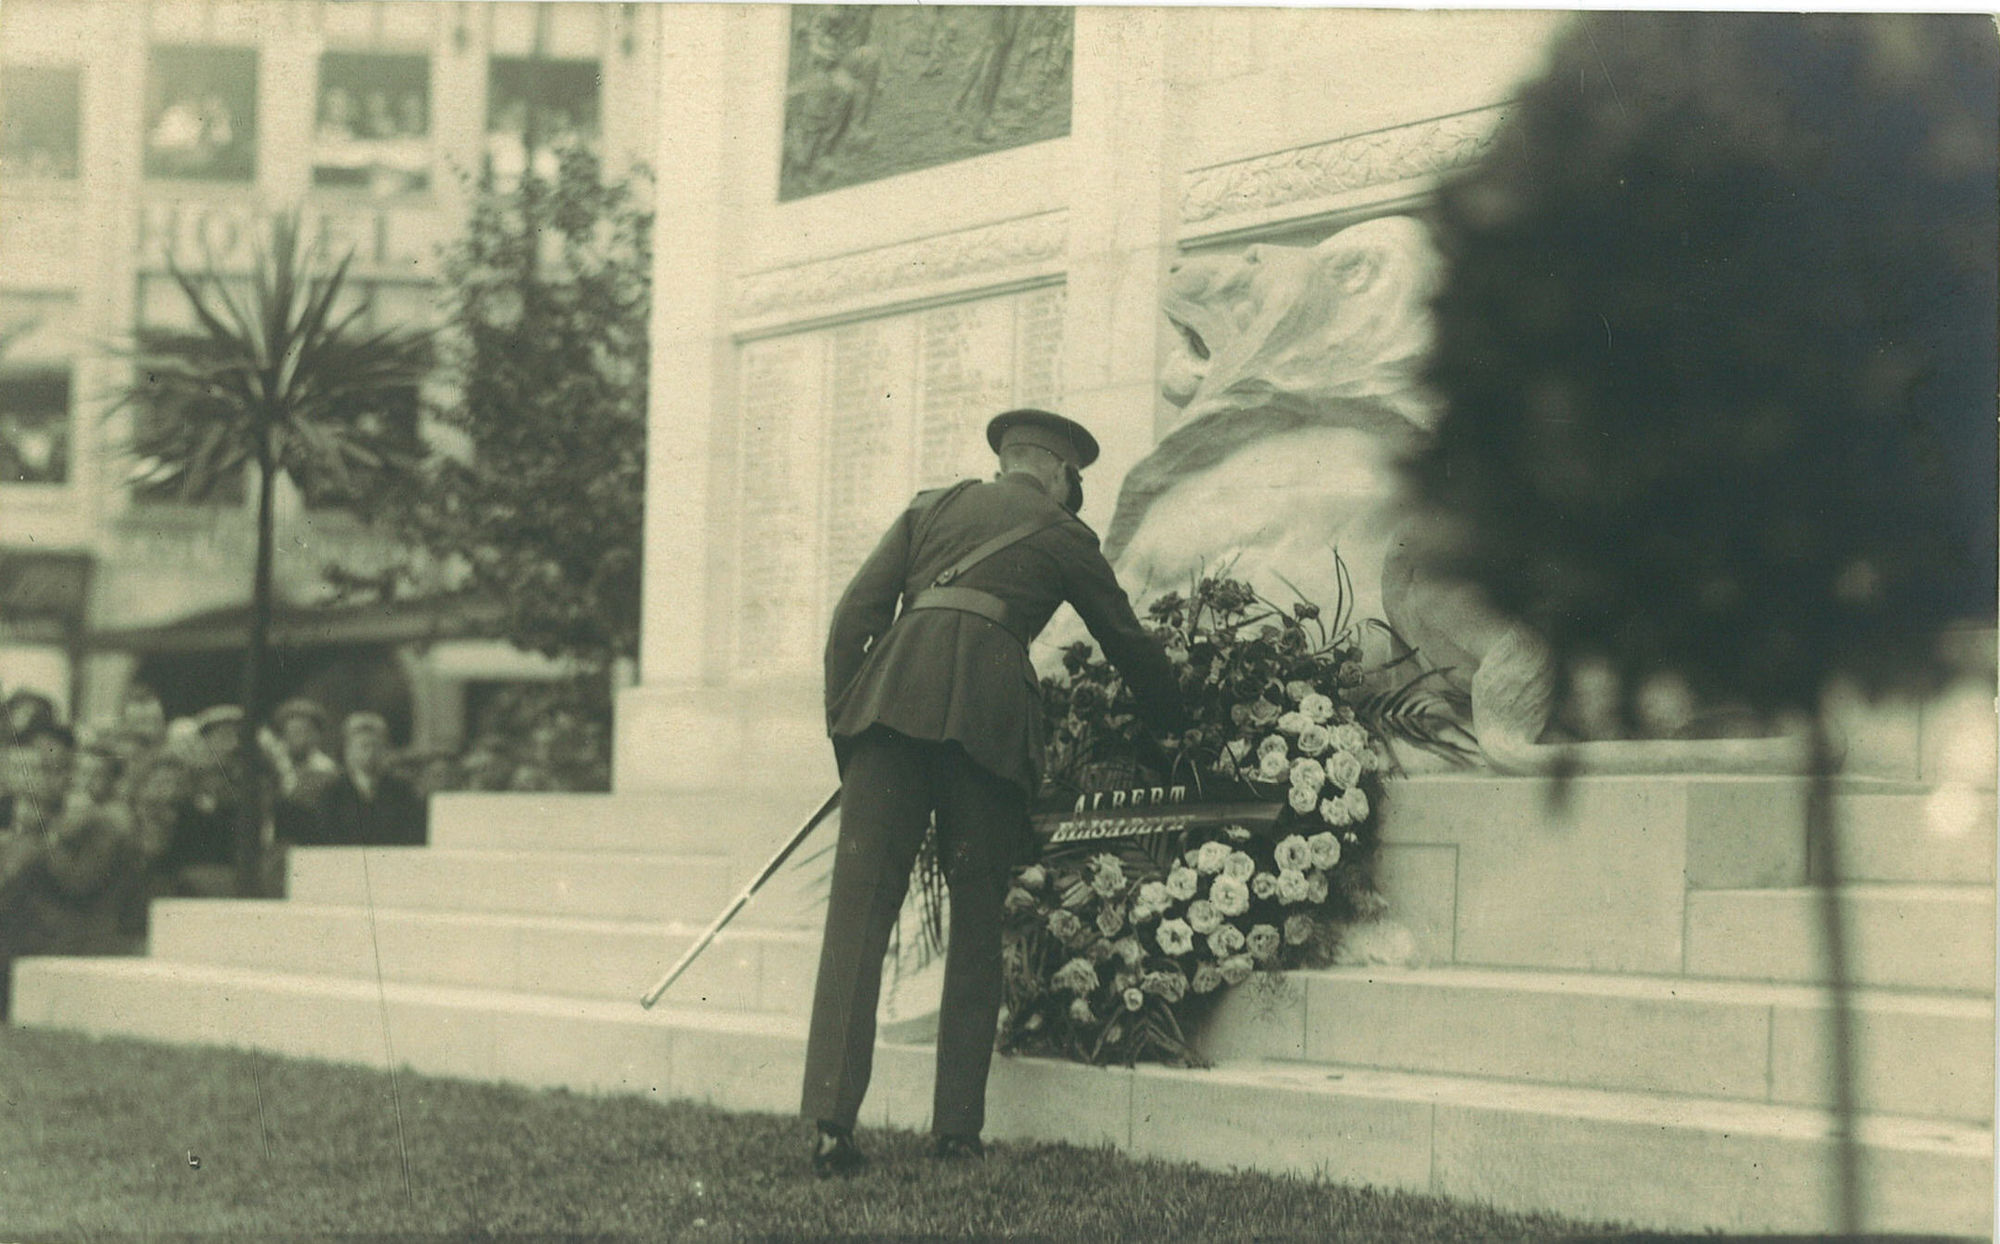 Kransneerlegging bij oorlogsmonument 1914-1918 door prins Leopold op 15 juli 1923